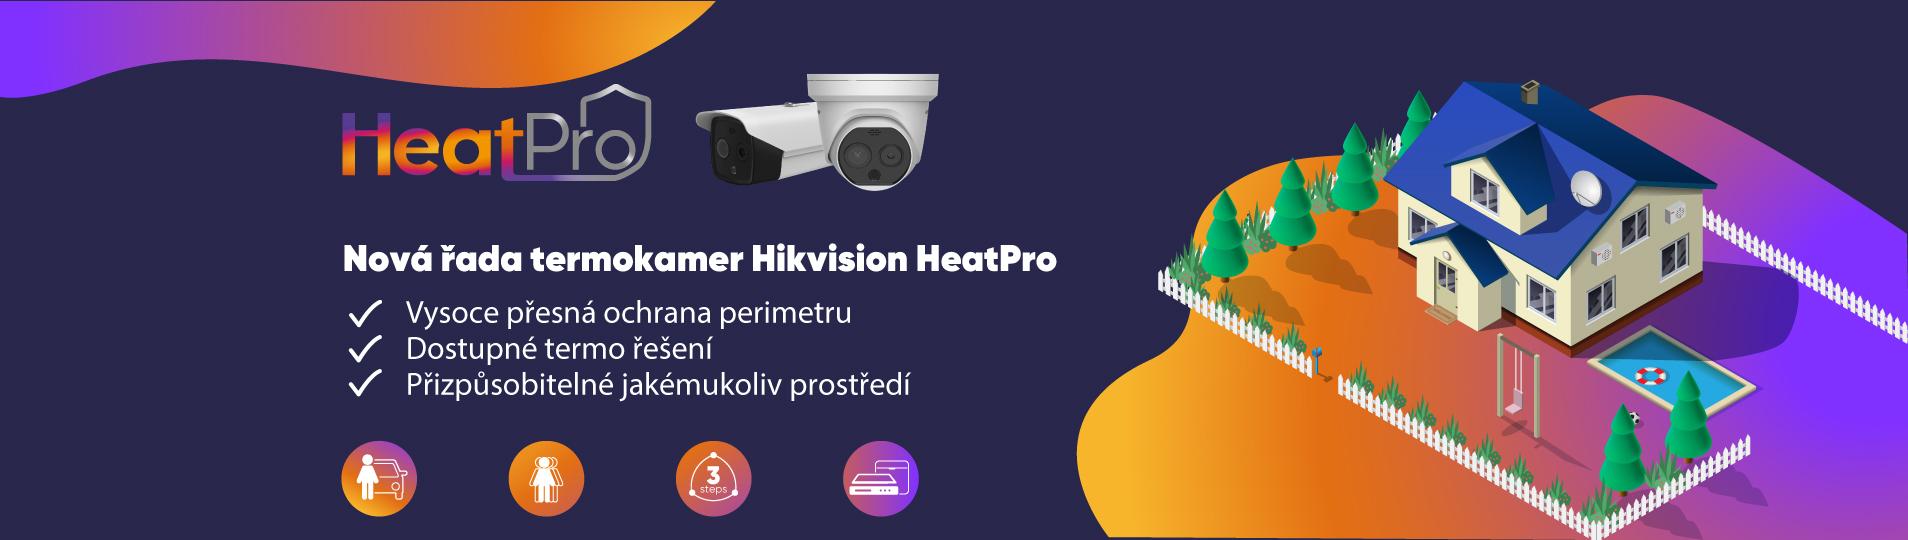 HeatPro